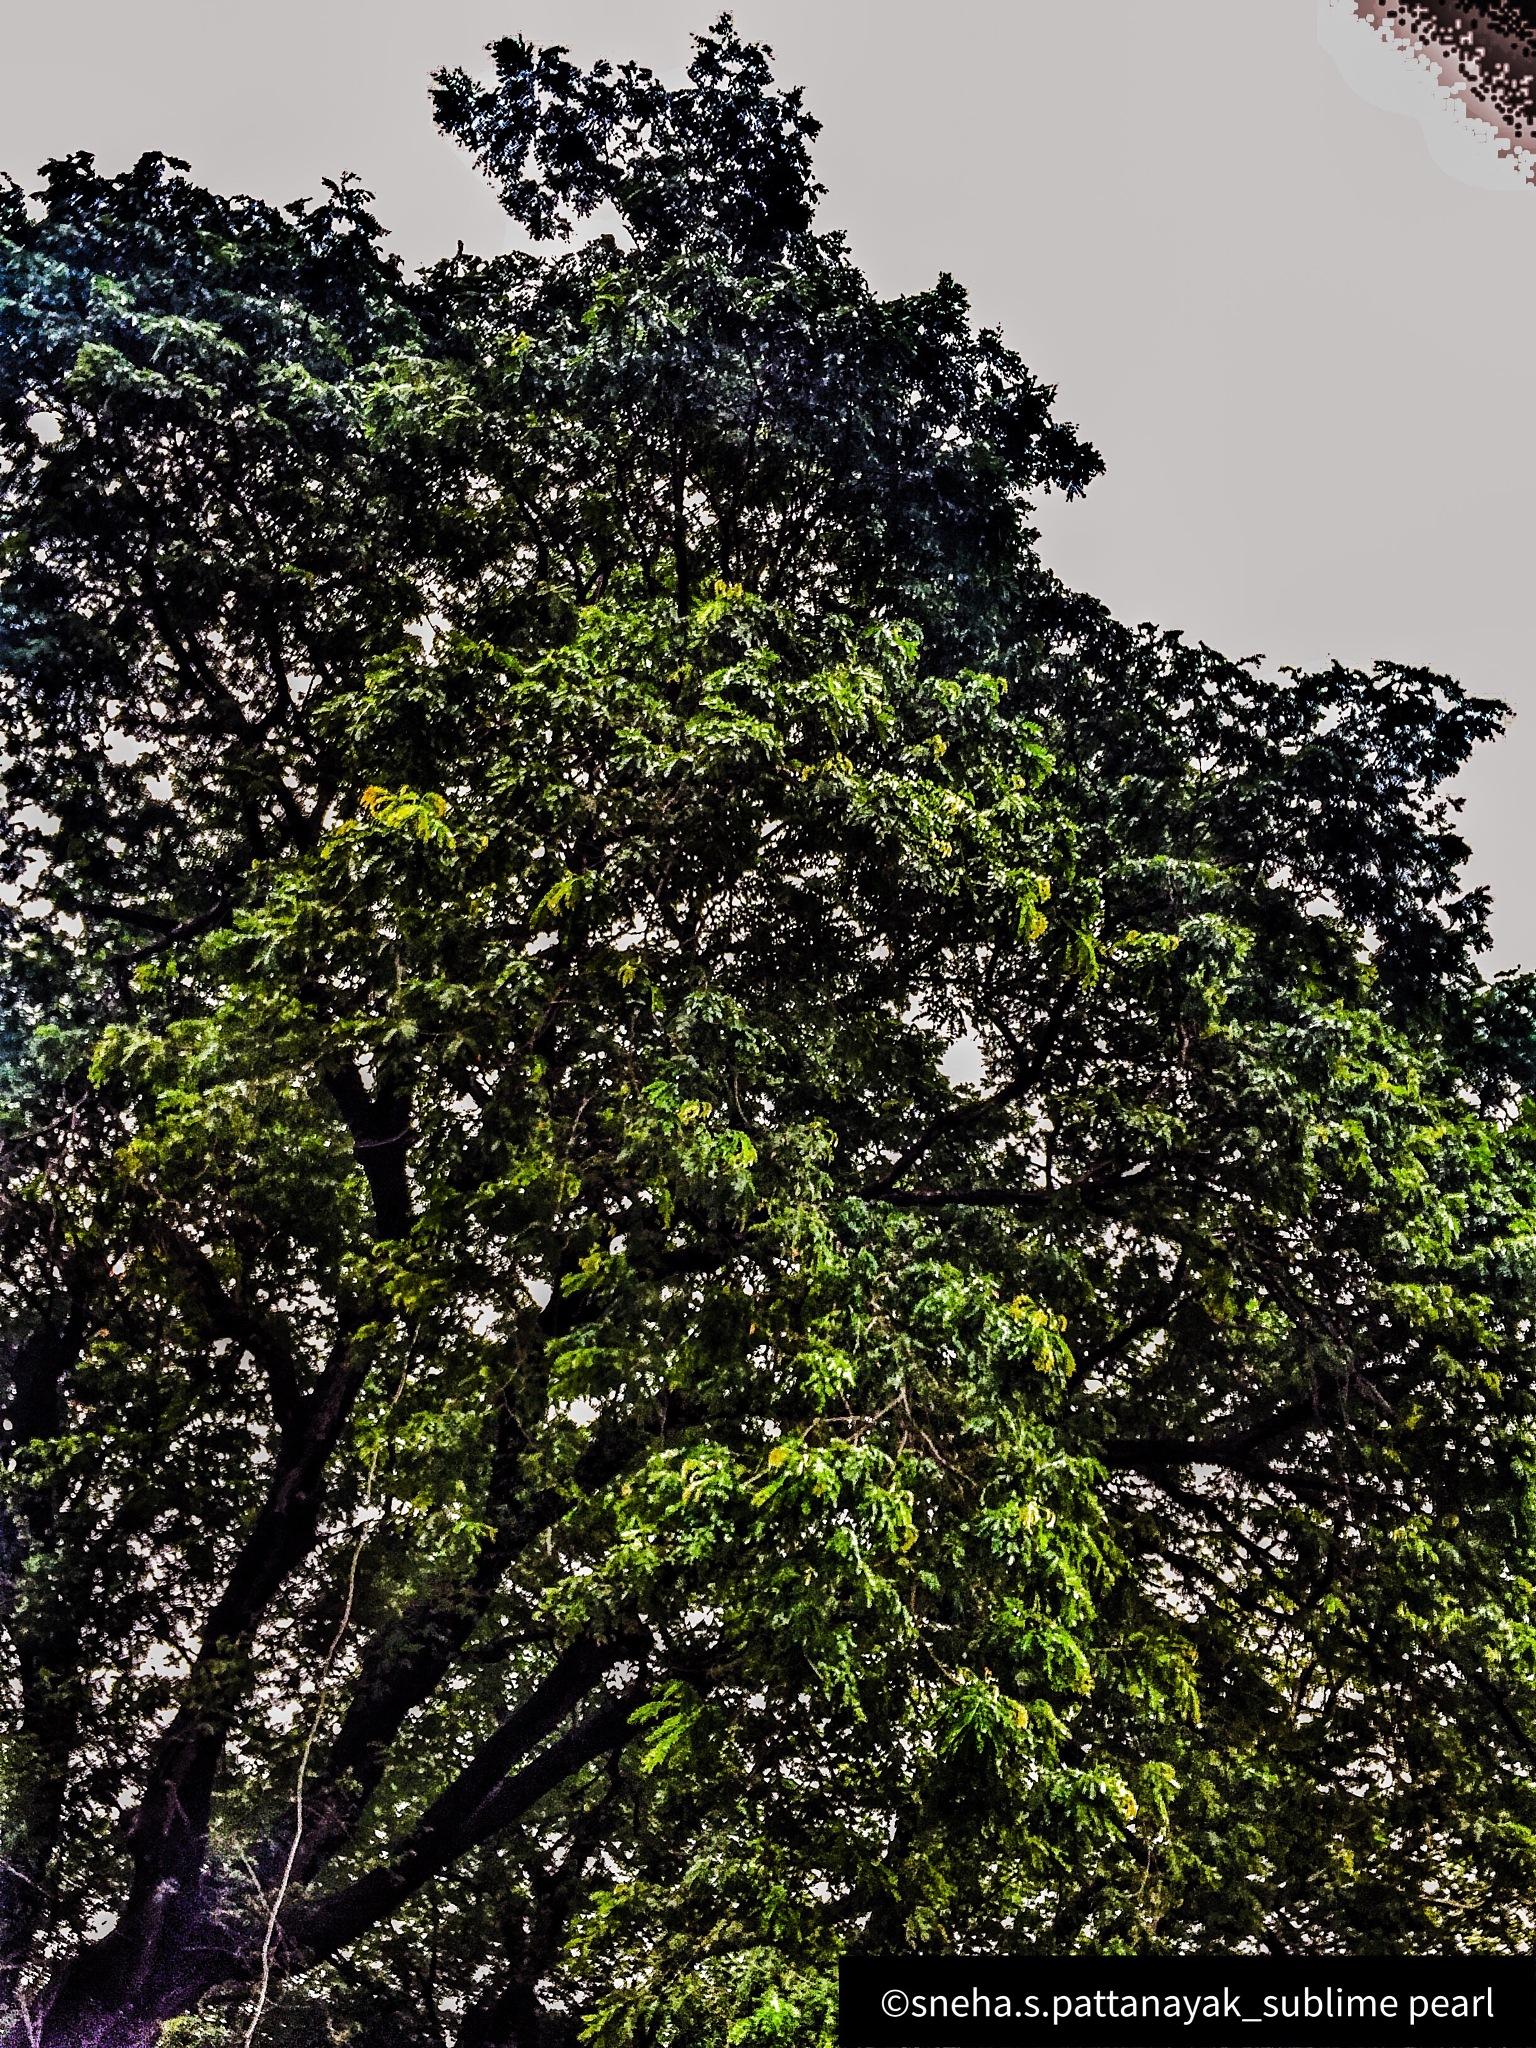 Untitled by Sneha Pattanayak